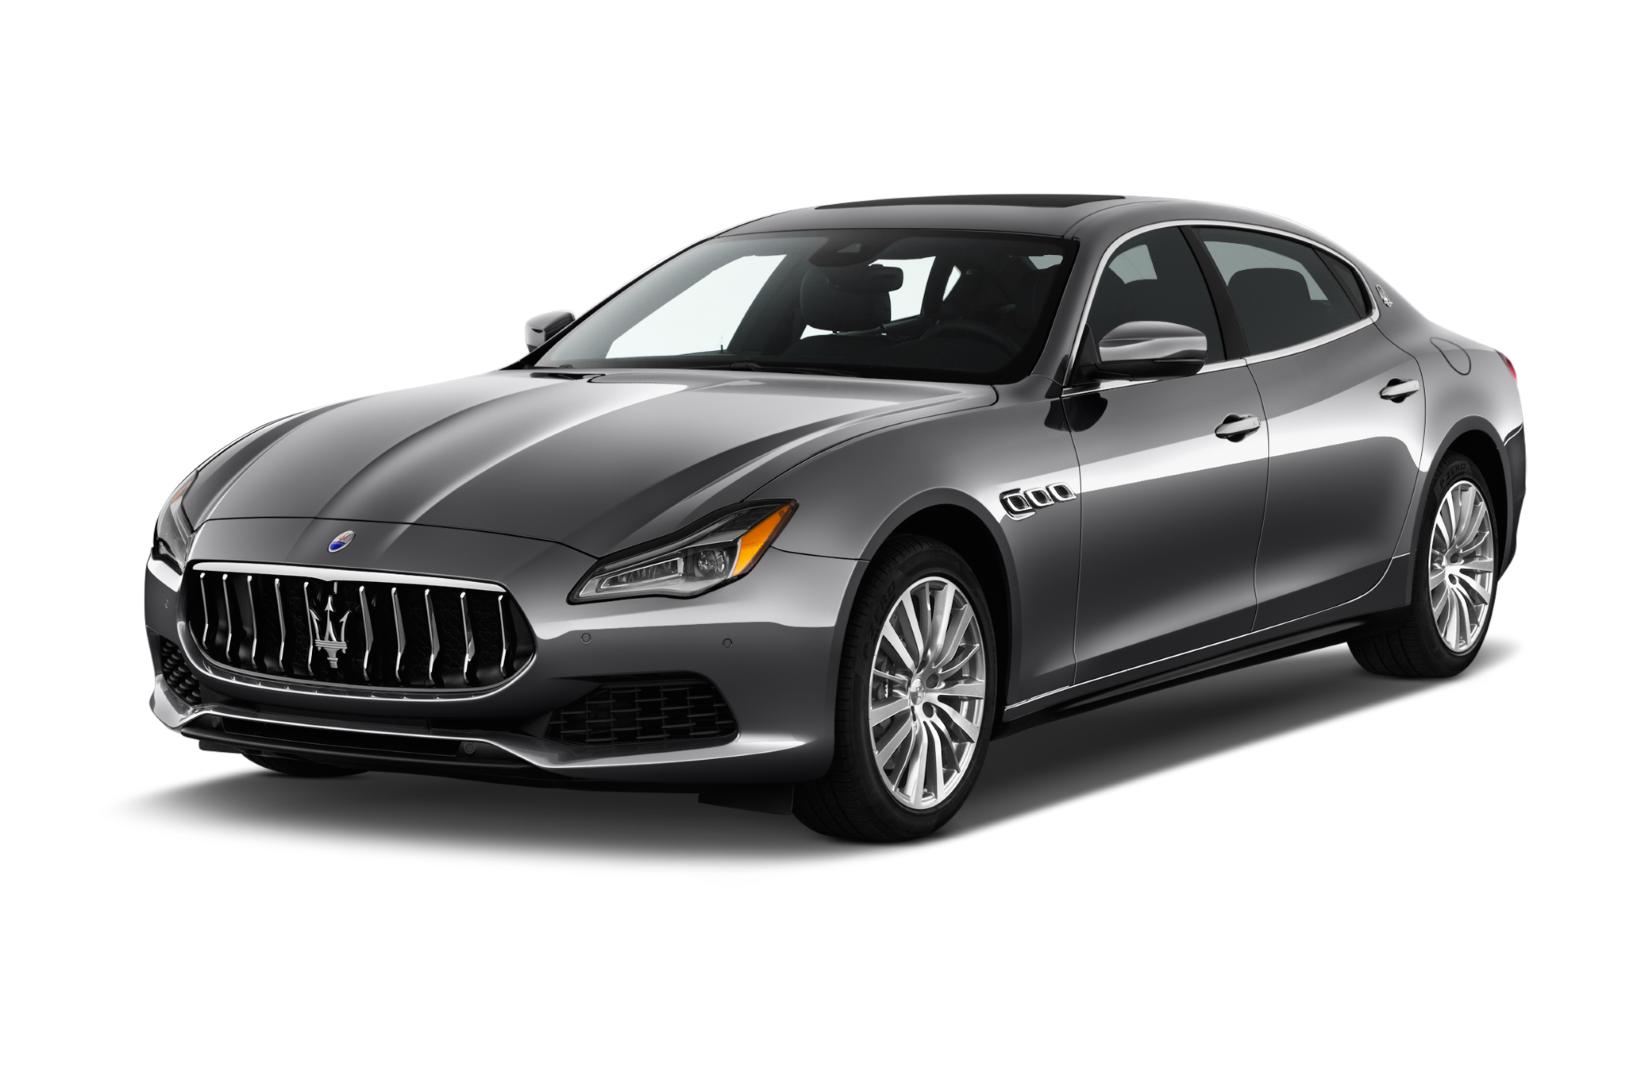 Maserati Quattroporte 2020 3.0T V6 S GranSport, Saudi Arabia, 2019 pics migration